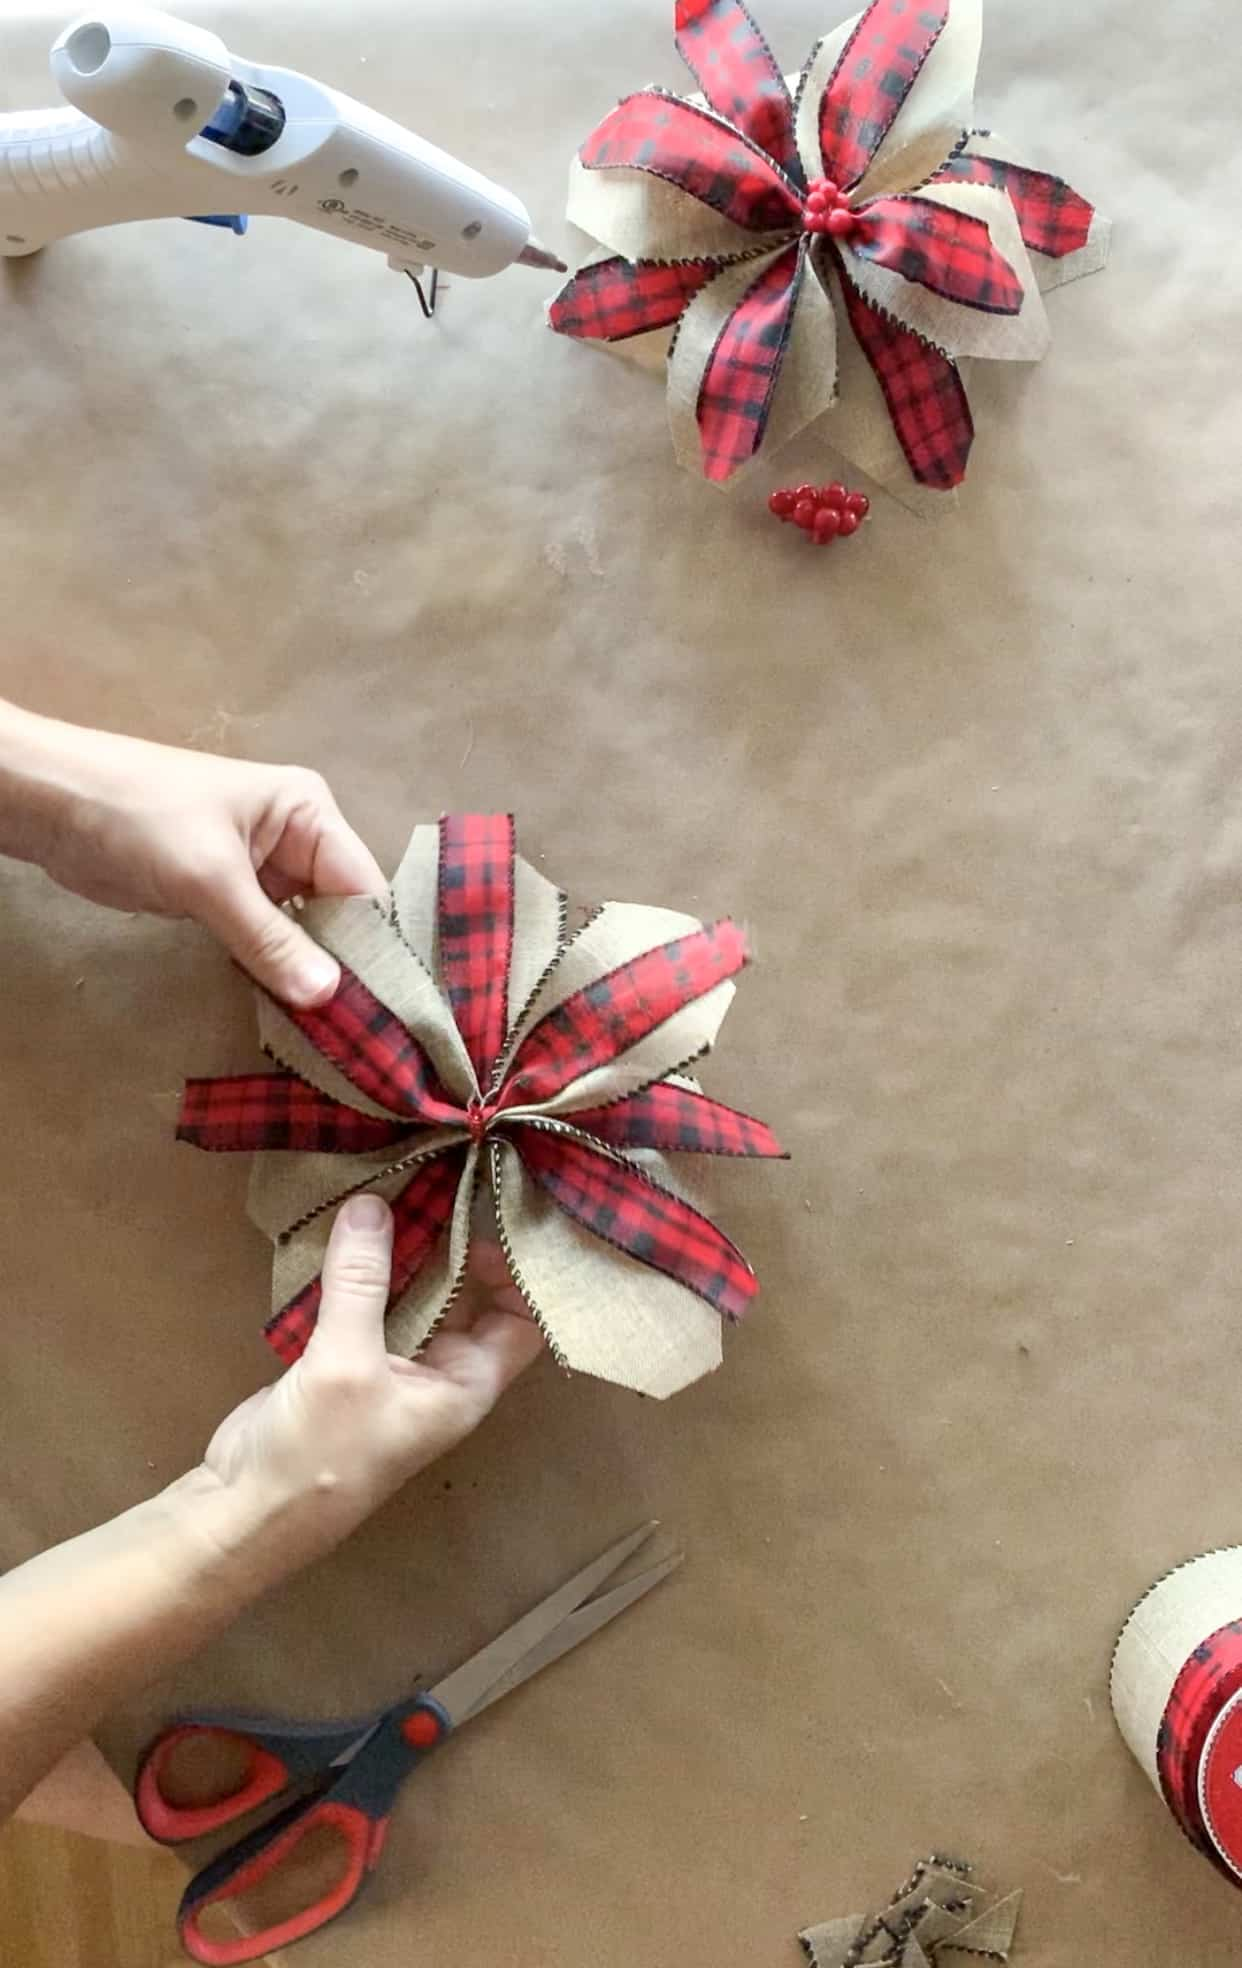 Fluffing ribbon poinsettia.